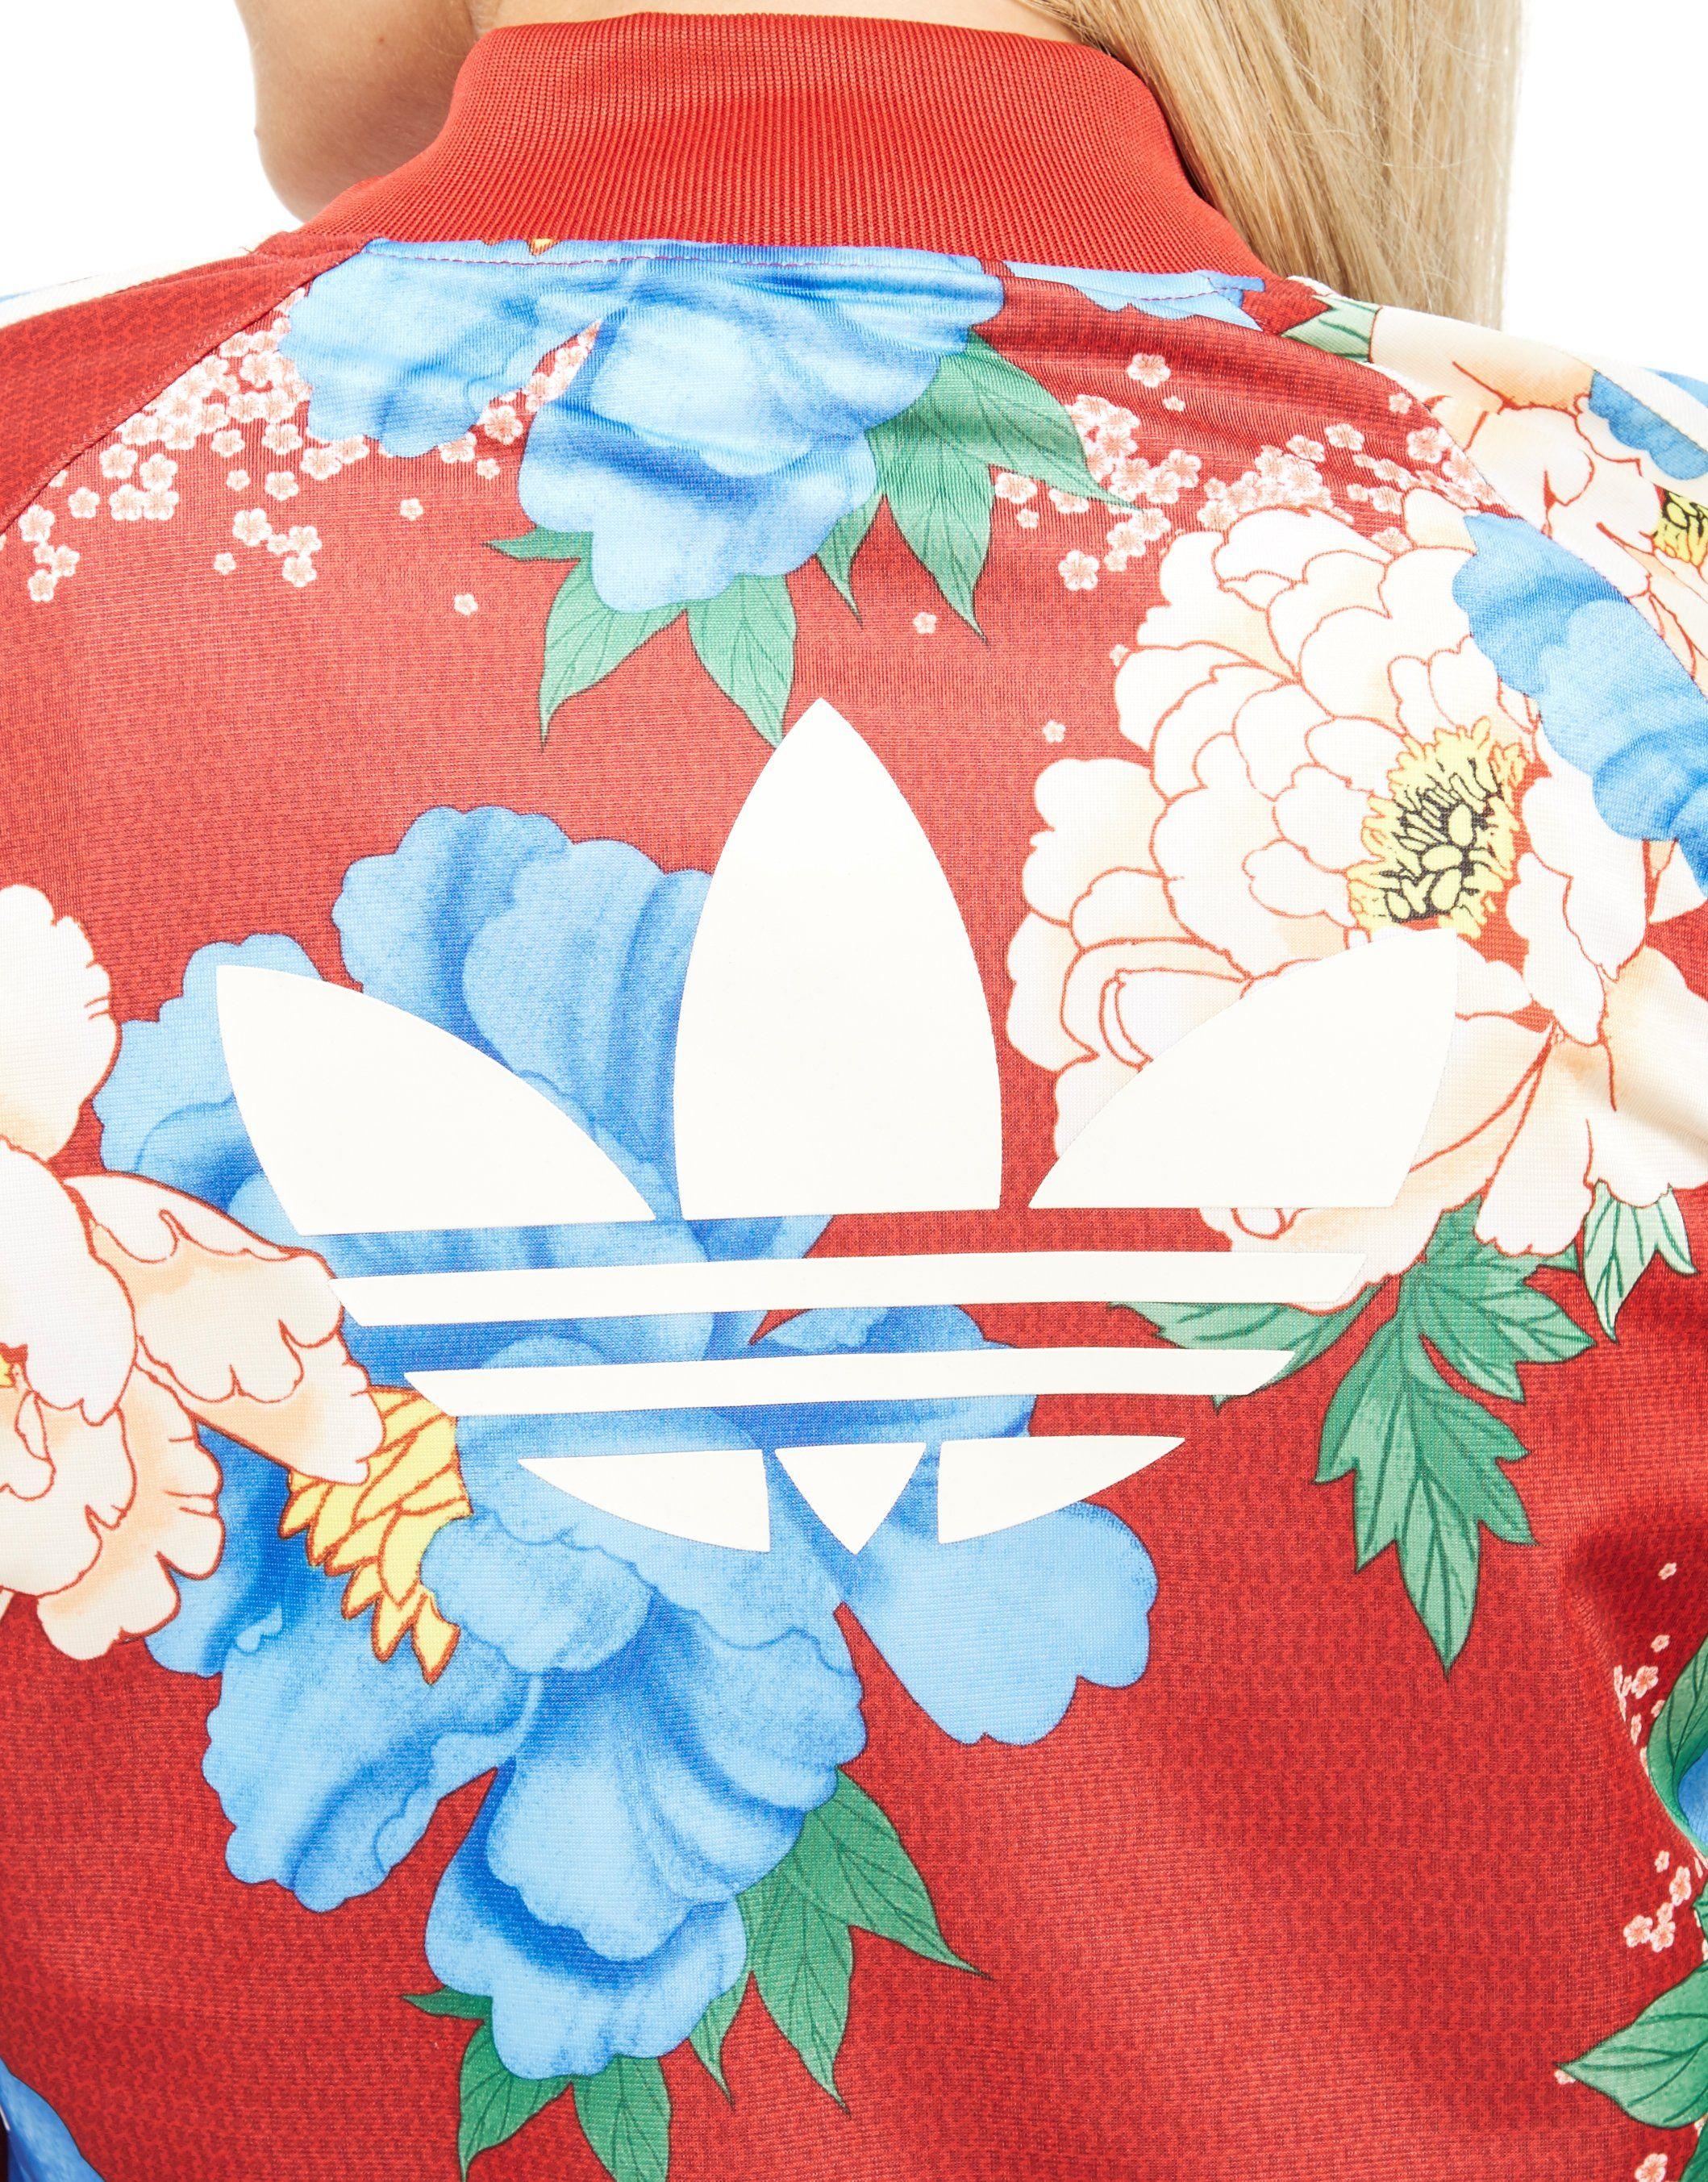 adidas Originals FARM Superstar Jacket